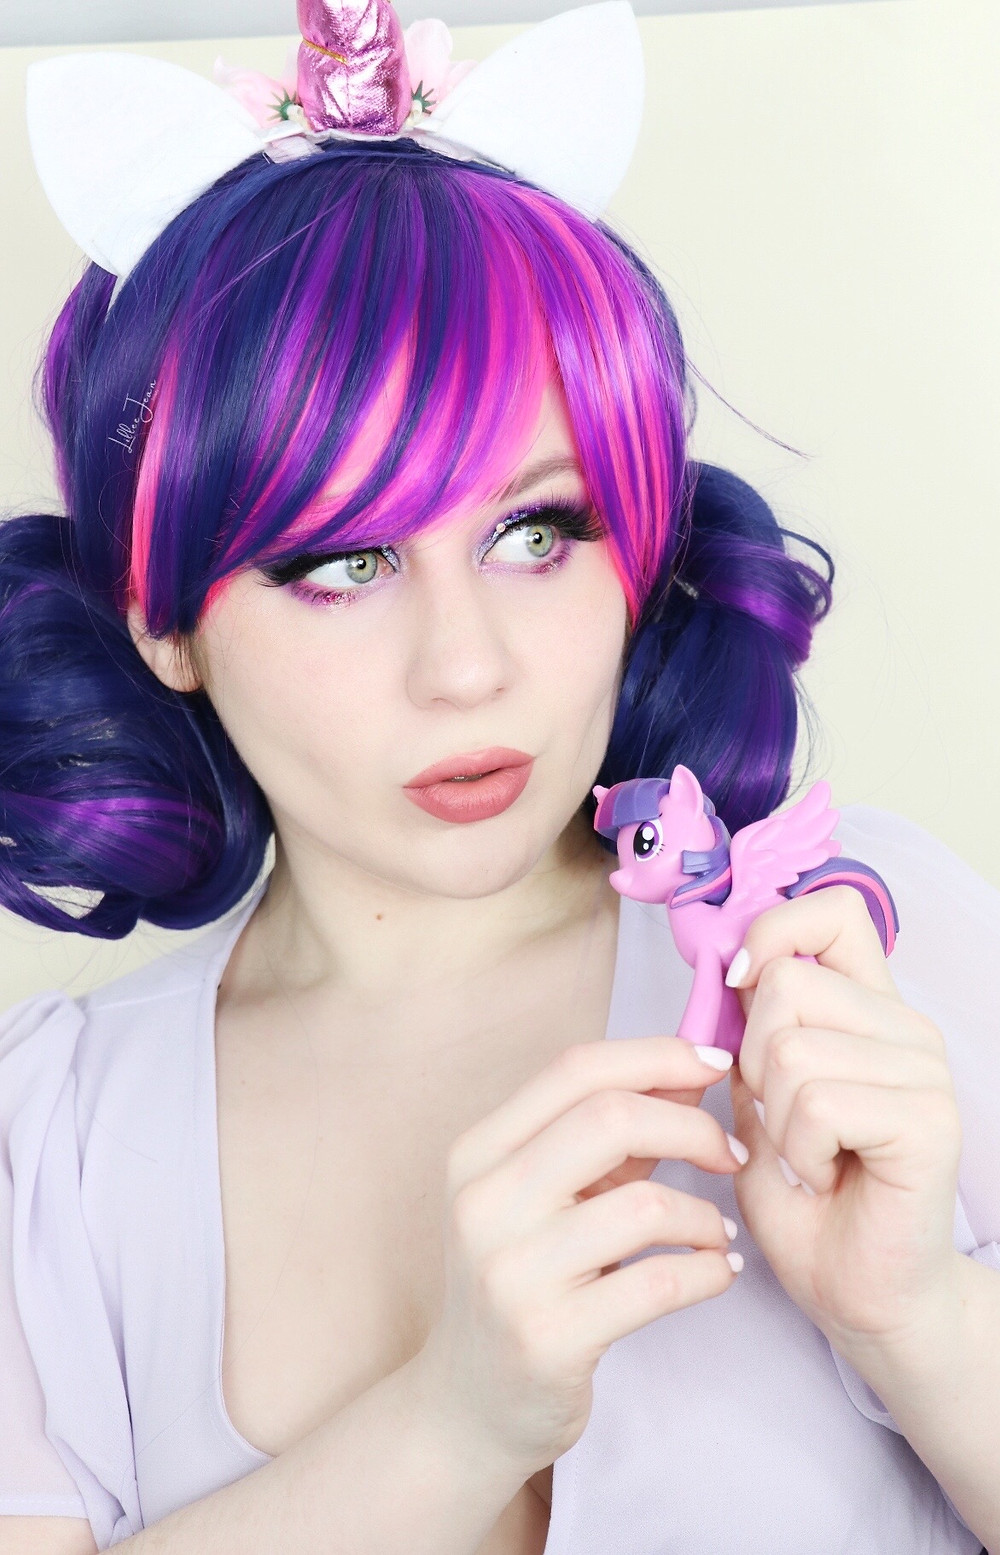 Twilight Sparkle My Little Pony Makeup | HIPDOT Makeup Tutorial 2021 | Lillee Jean